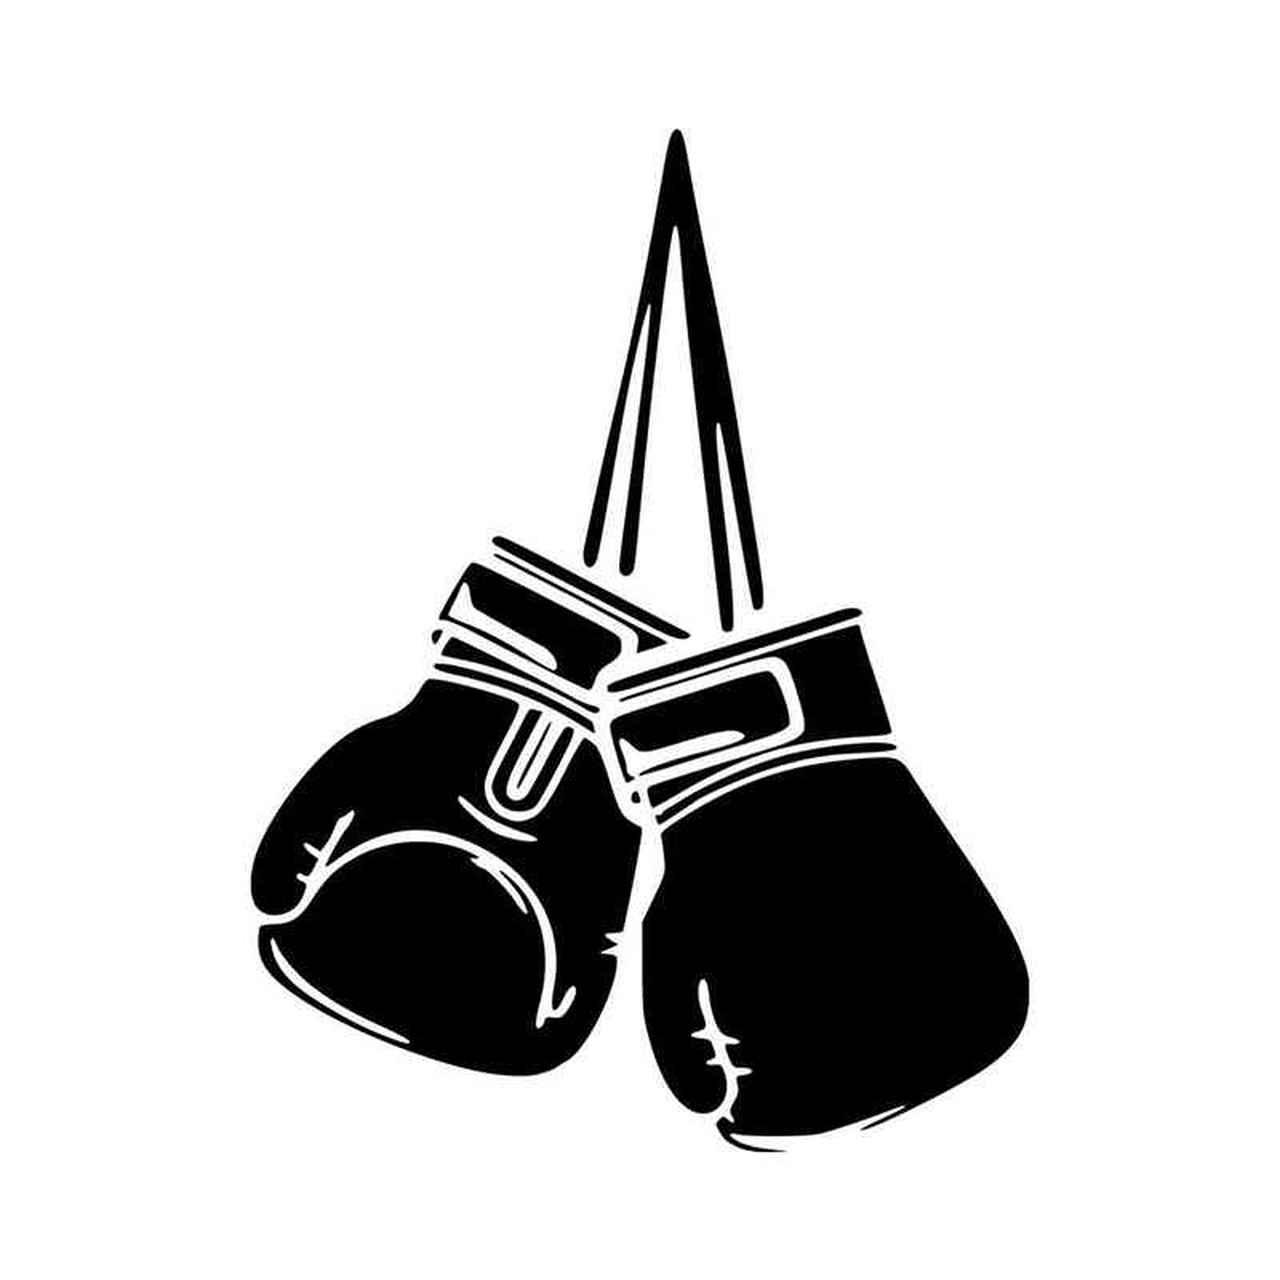 Boxing Gloves Vinyl Decal Sticker.